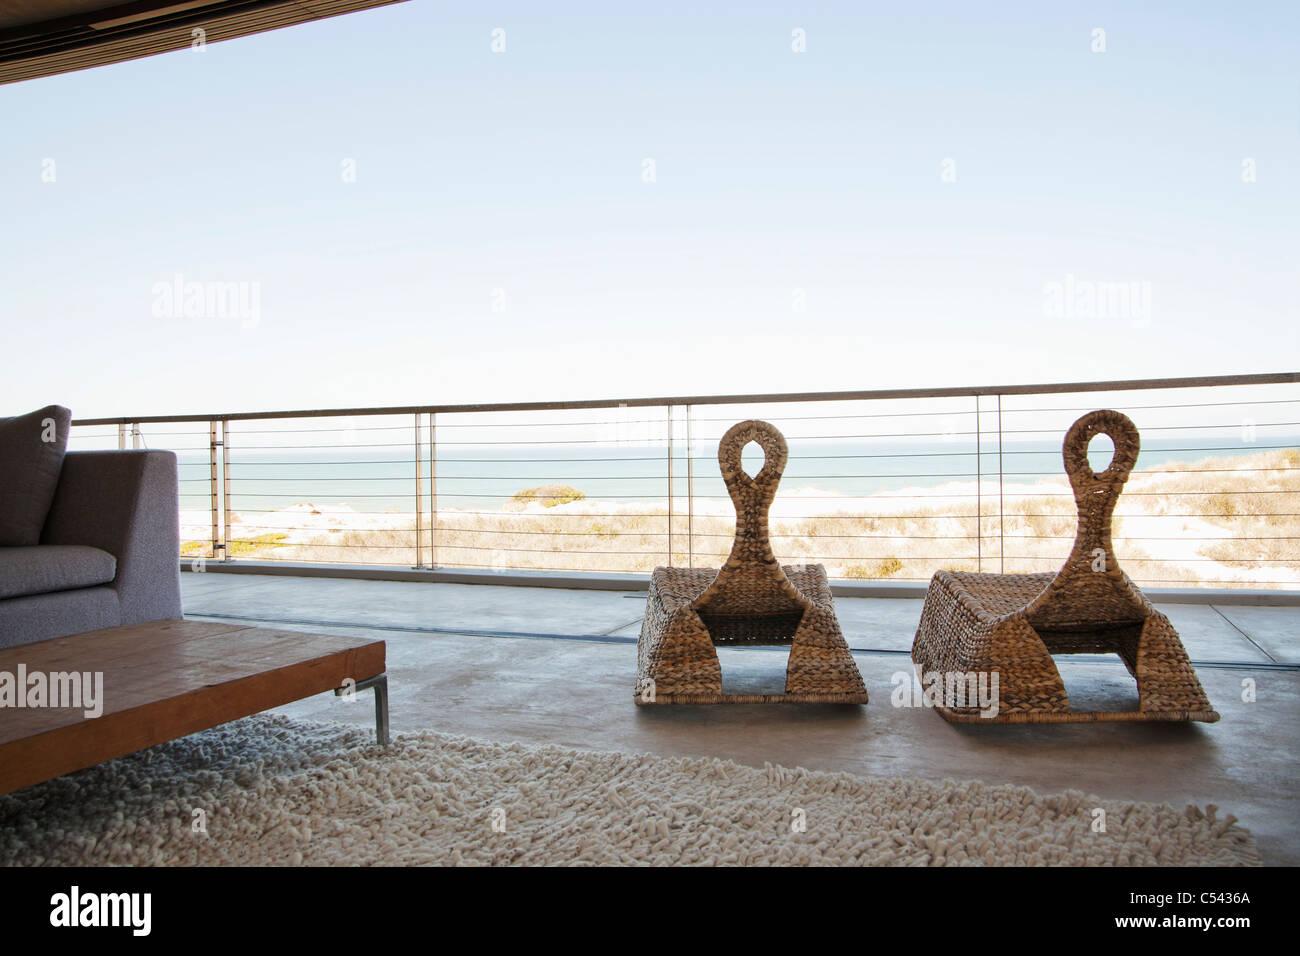 View of beach seen through balcony - Stock Image